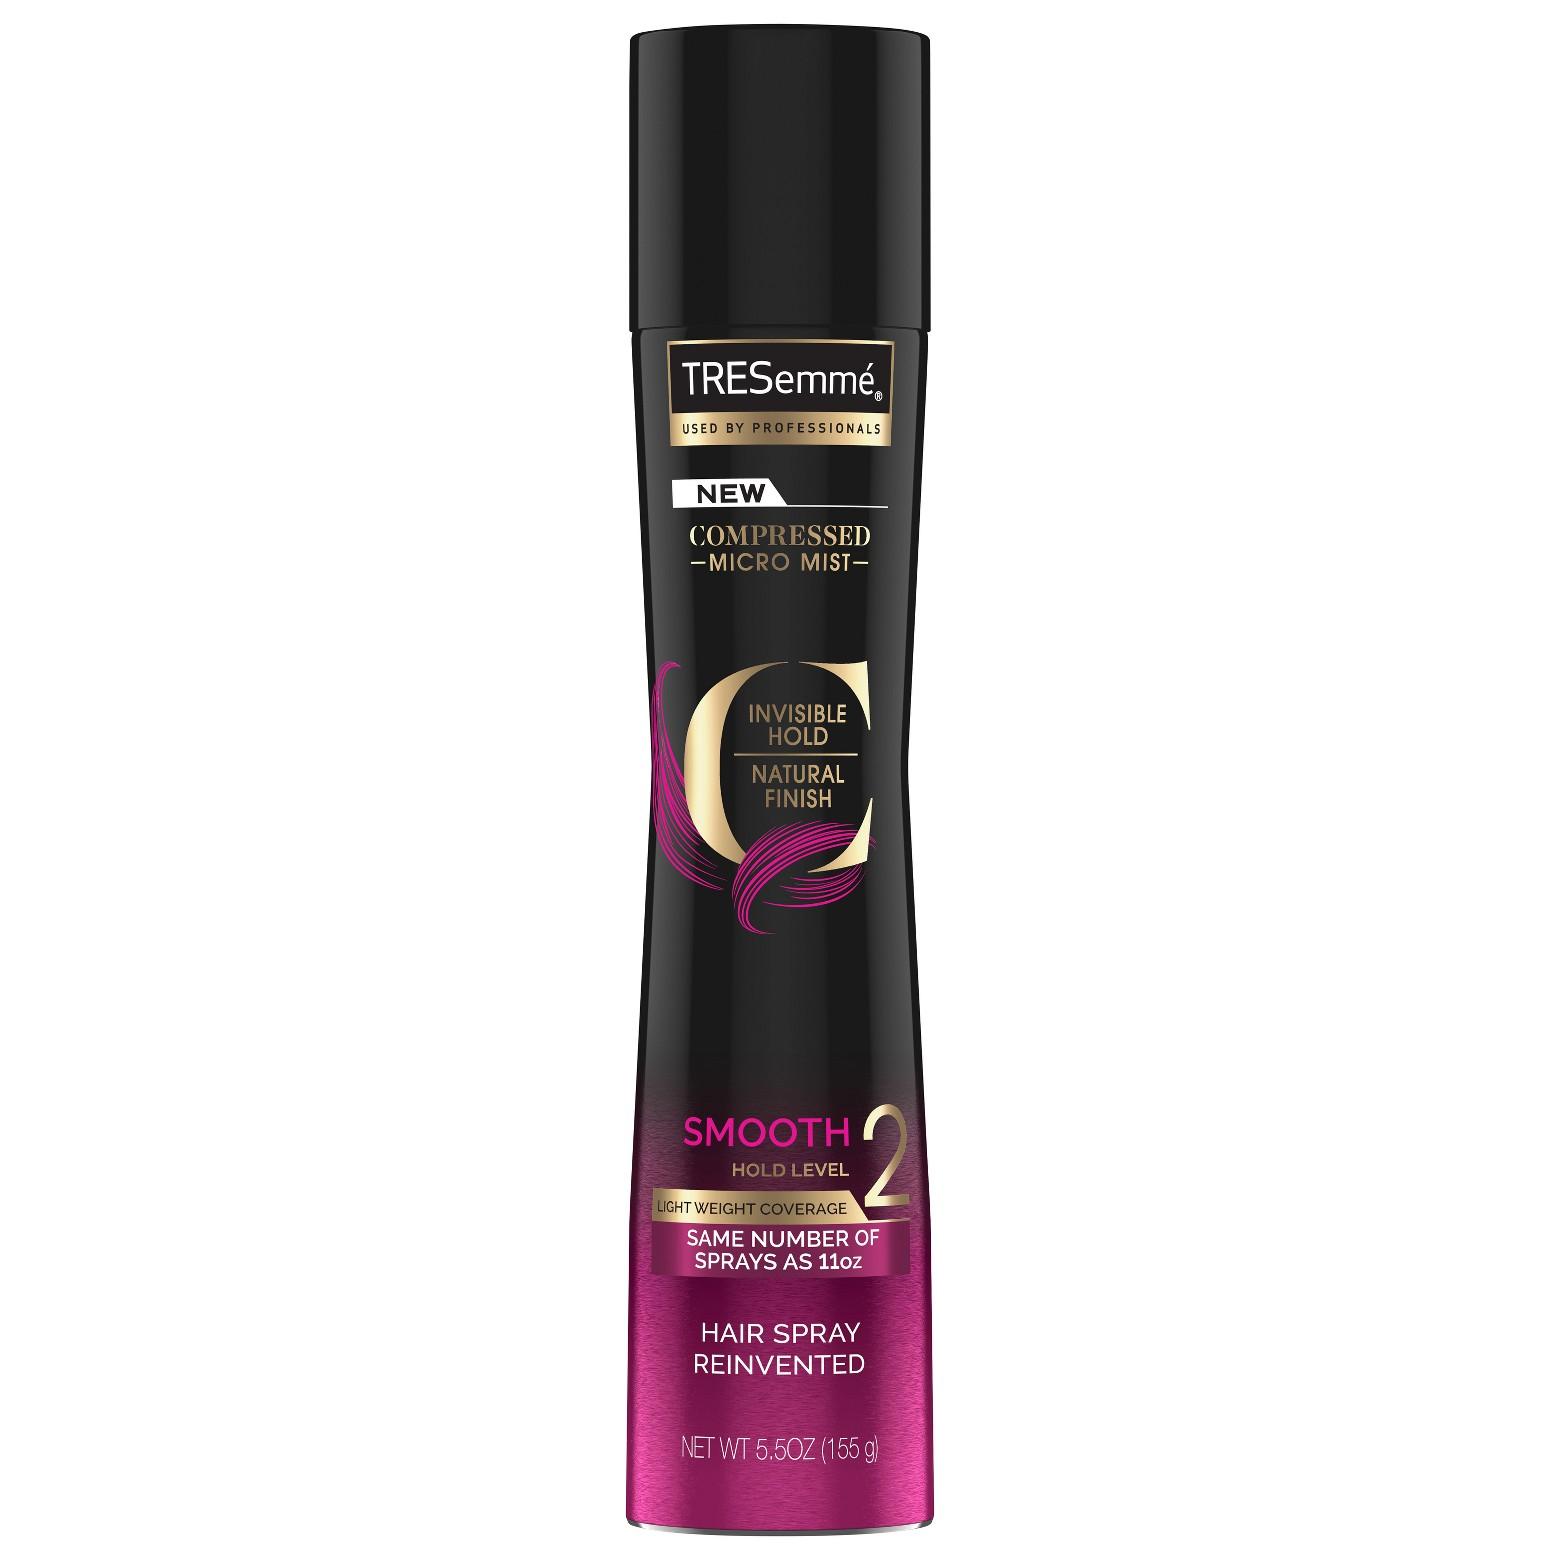 TRESemmé Compressed Micro Mist Hair Spray